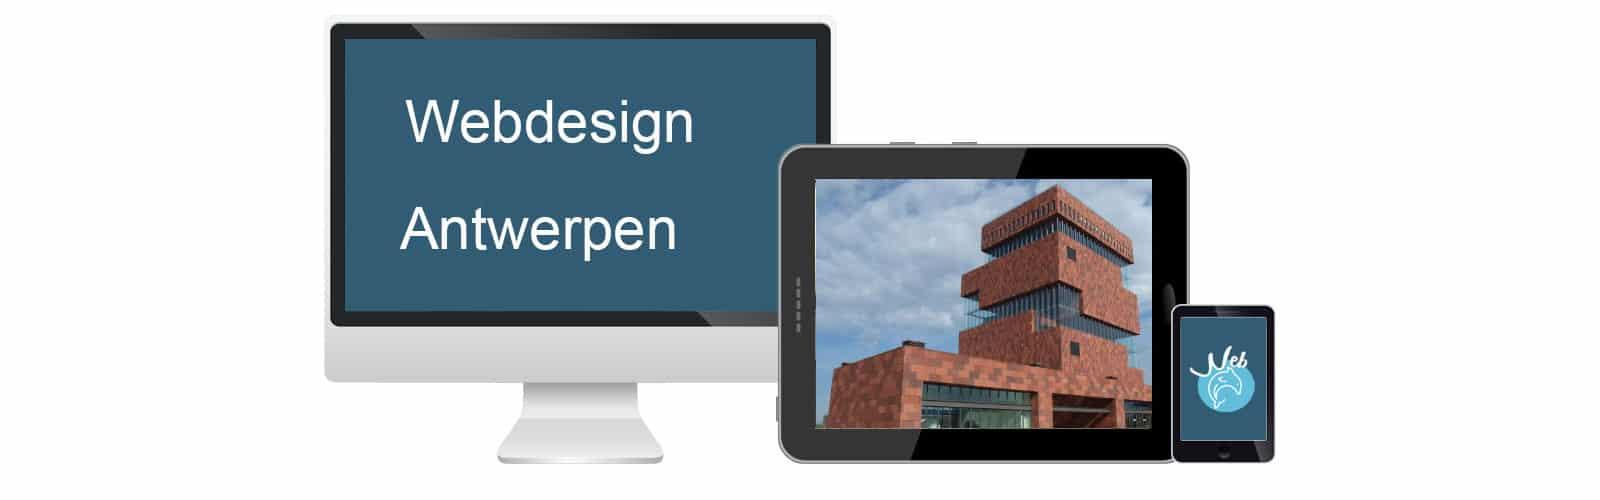 Webdesign Antwerpen - webdolfijn